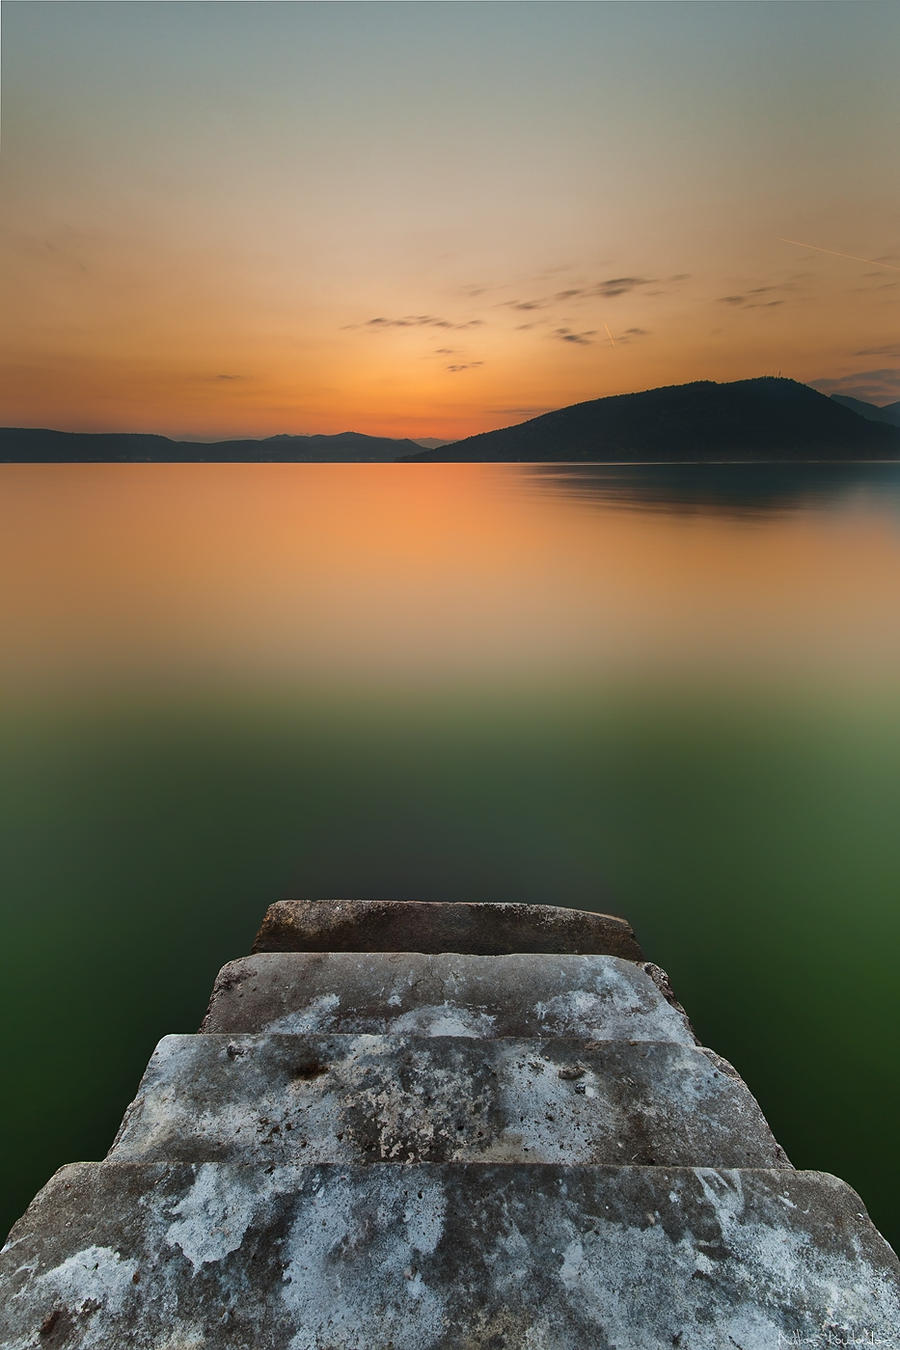 Calmness by NickKoutoulas